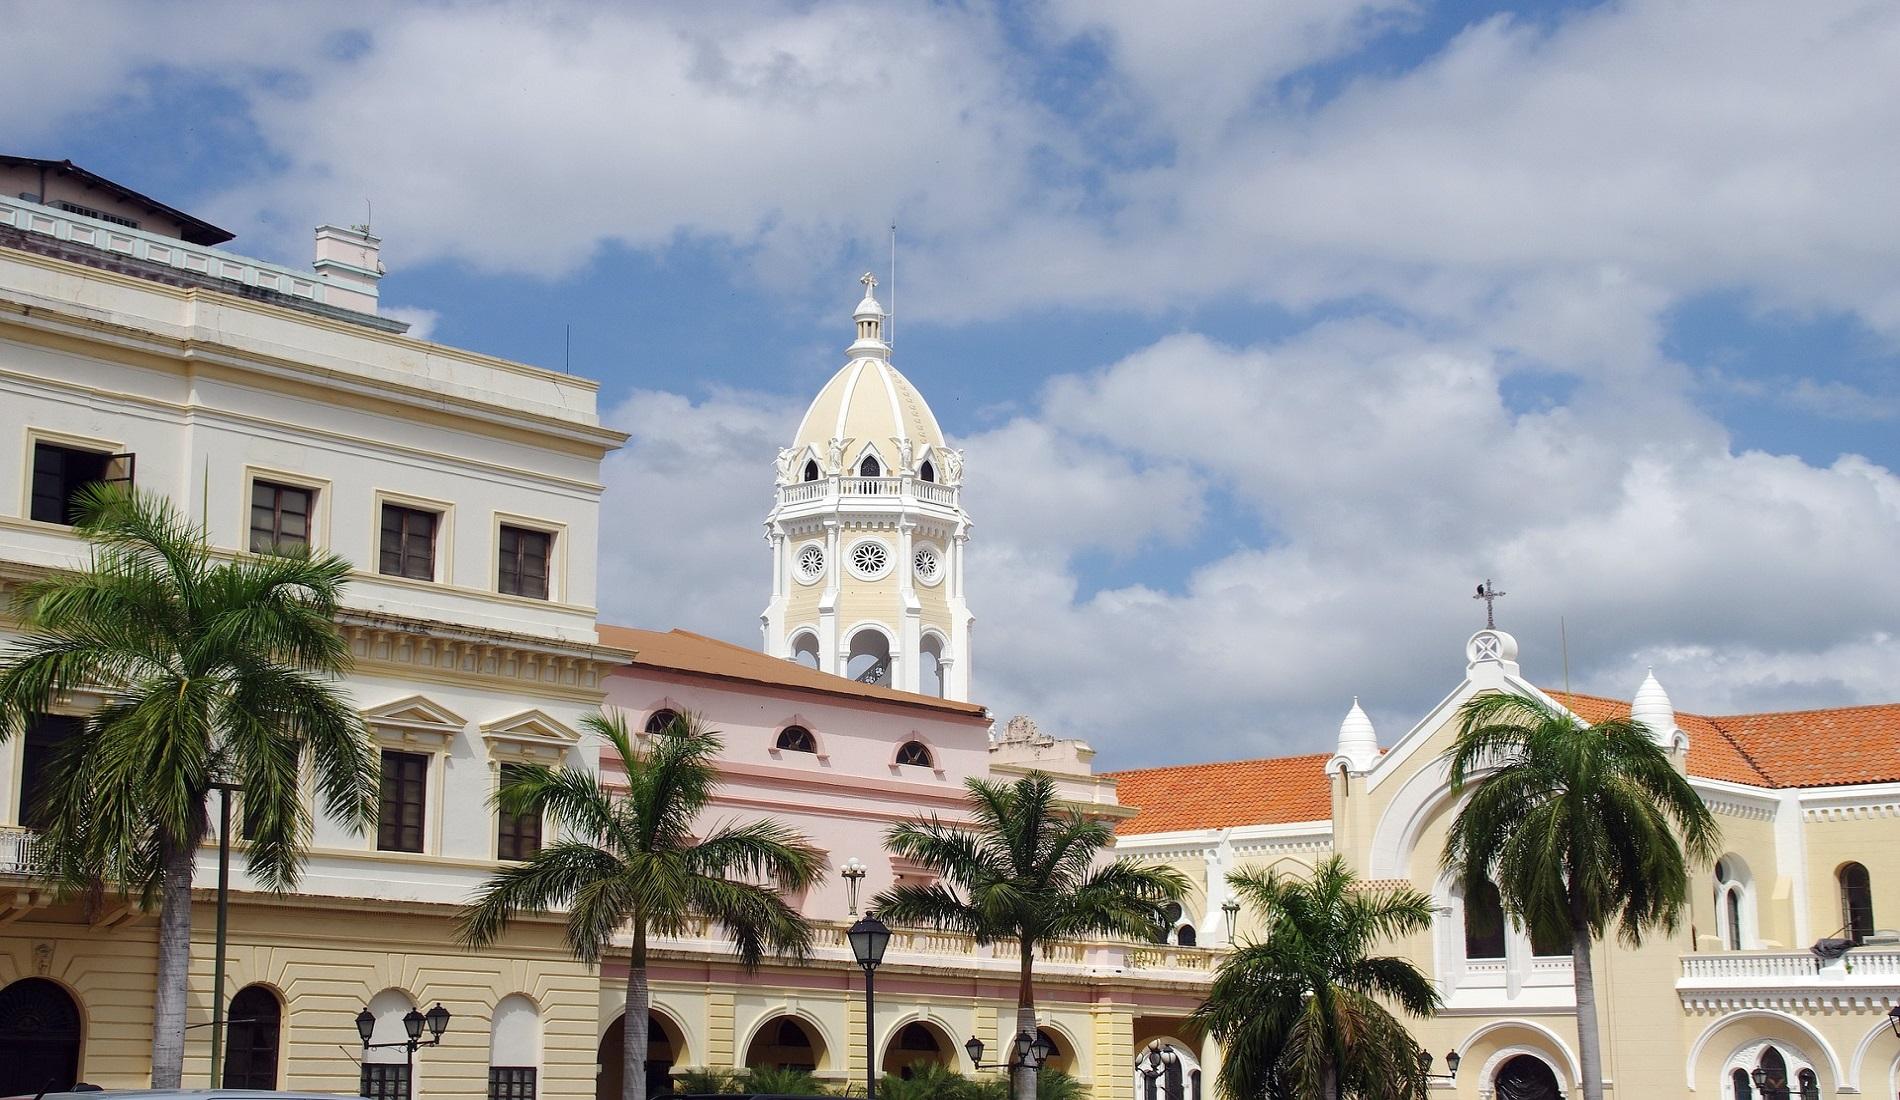 Panama-Stad casco viejo